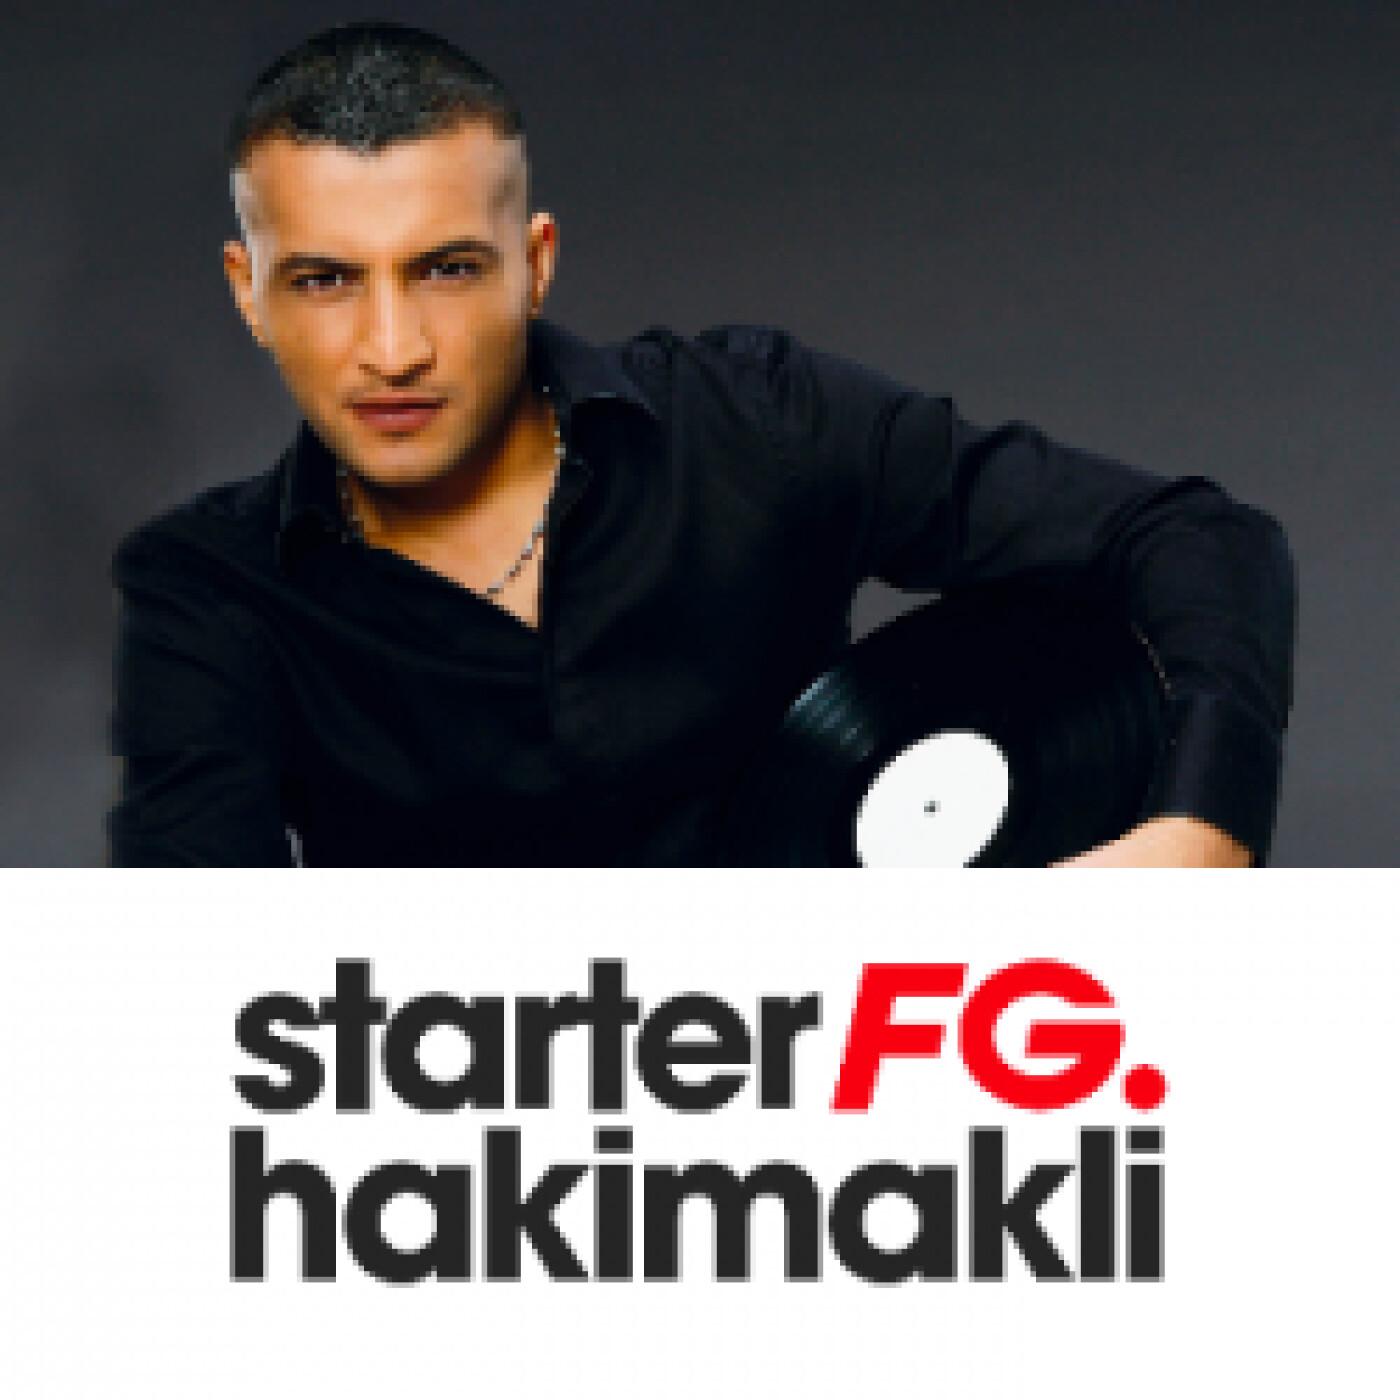 STARTER FG BY HAKIMAKLI MARDI 25 MAI 2021